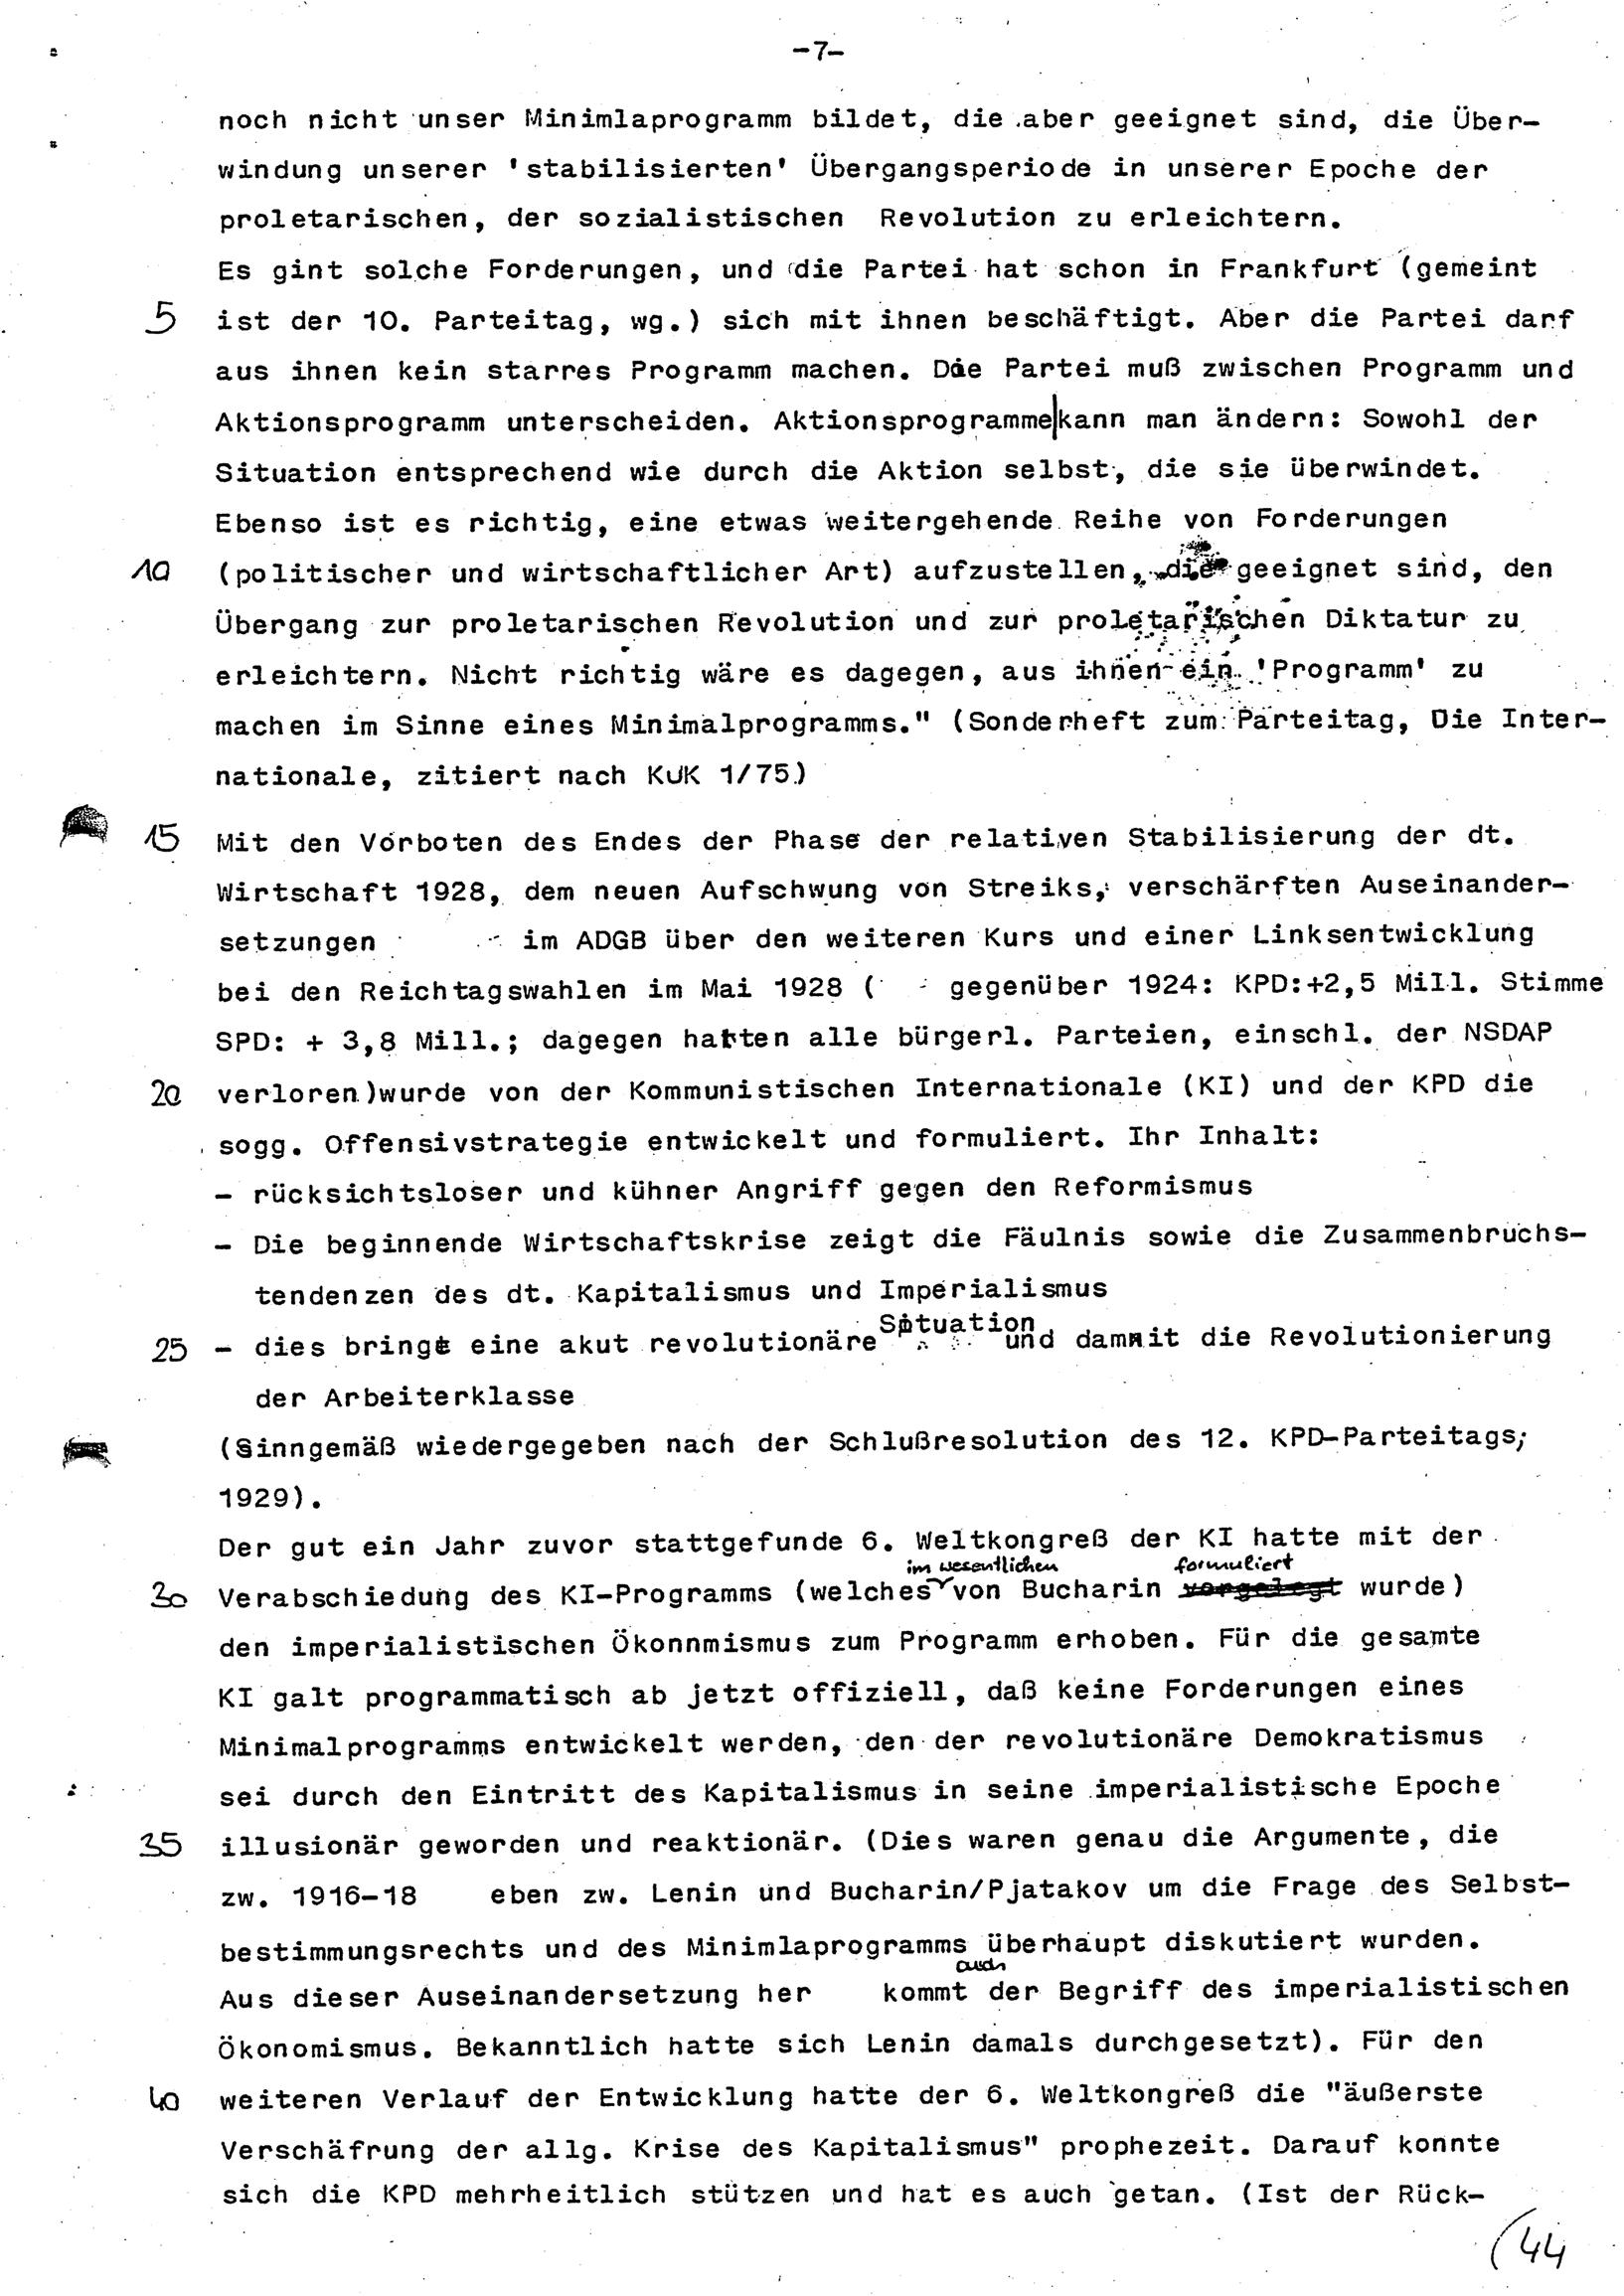 Ulm_KGU_Arbeitsheft_19830425_015_047